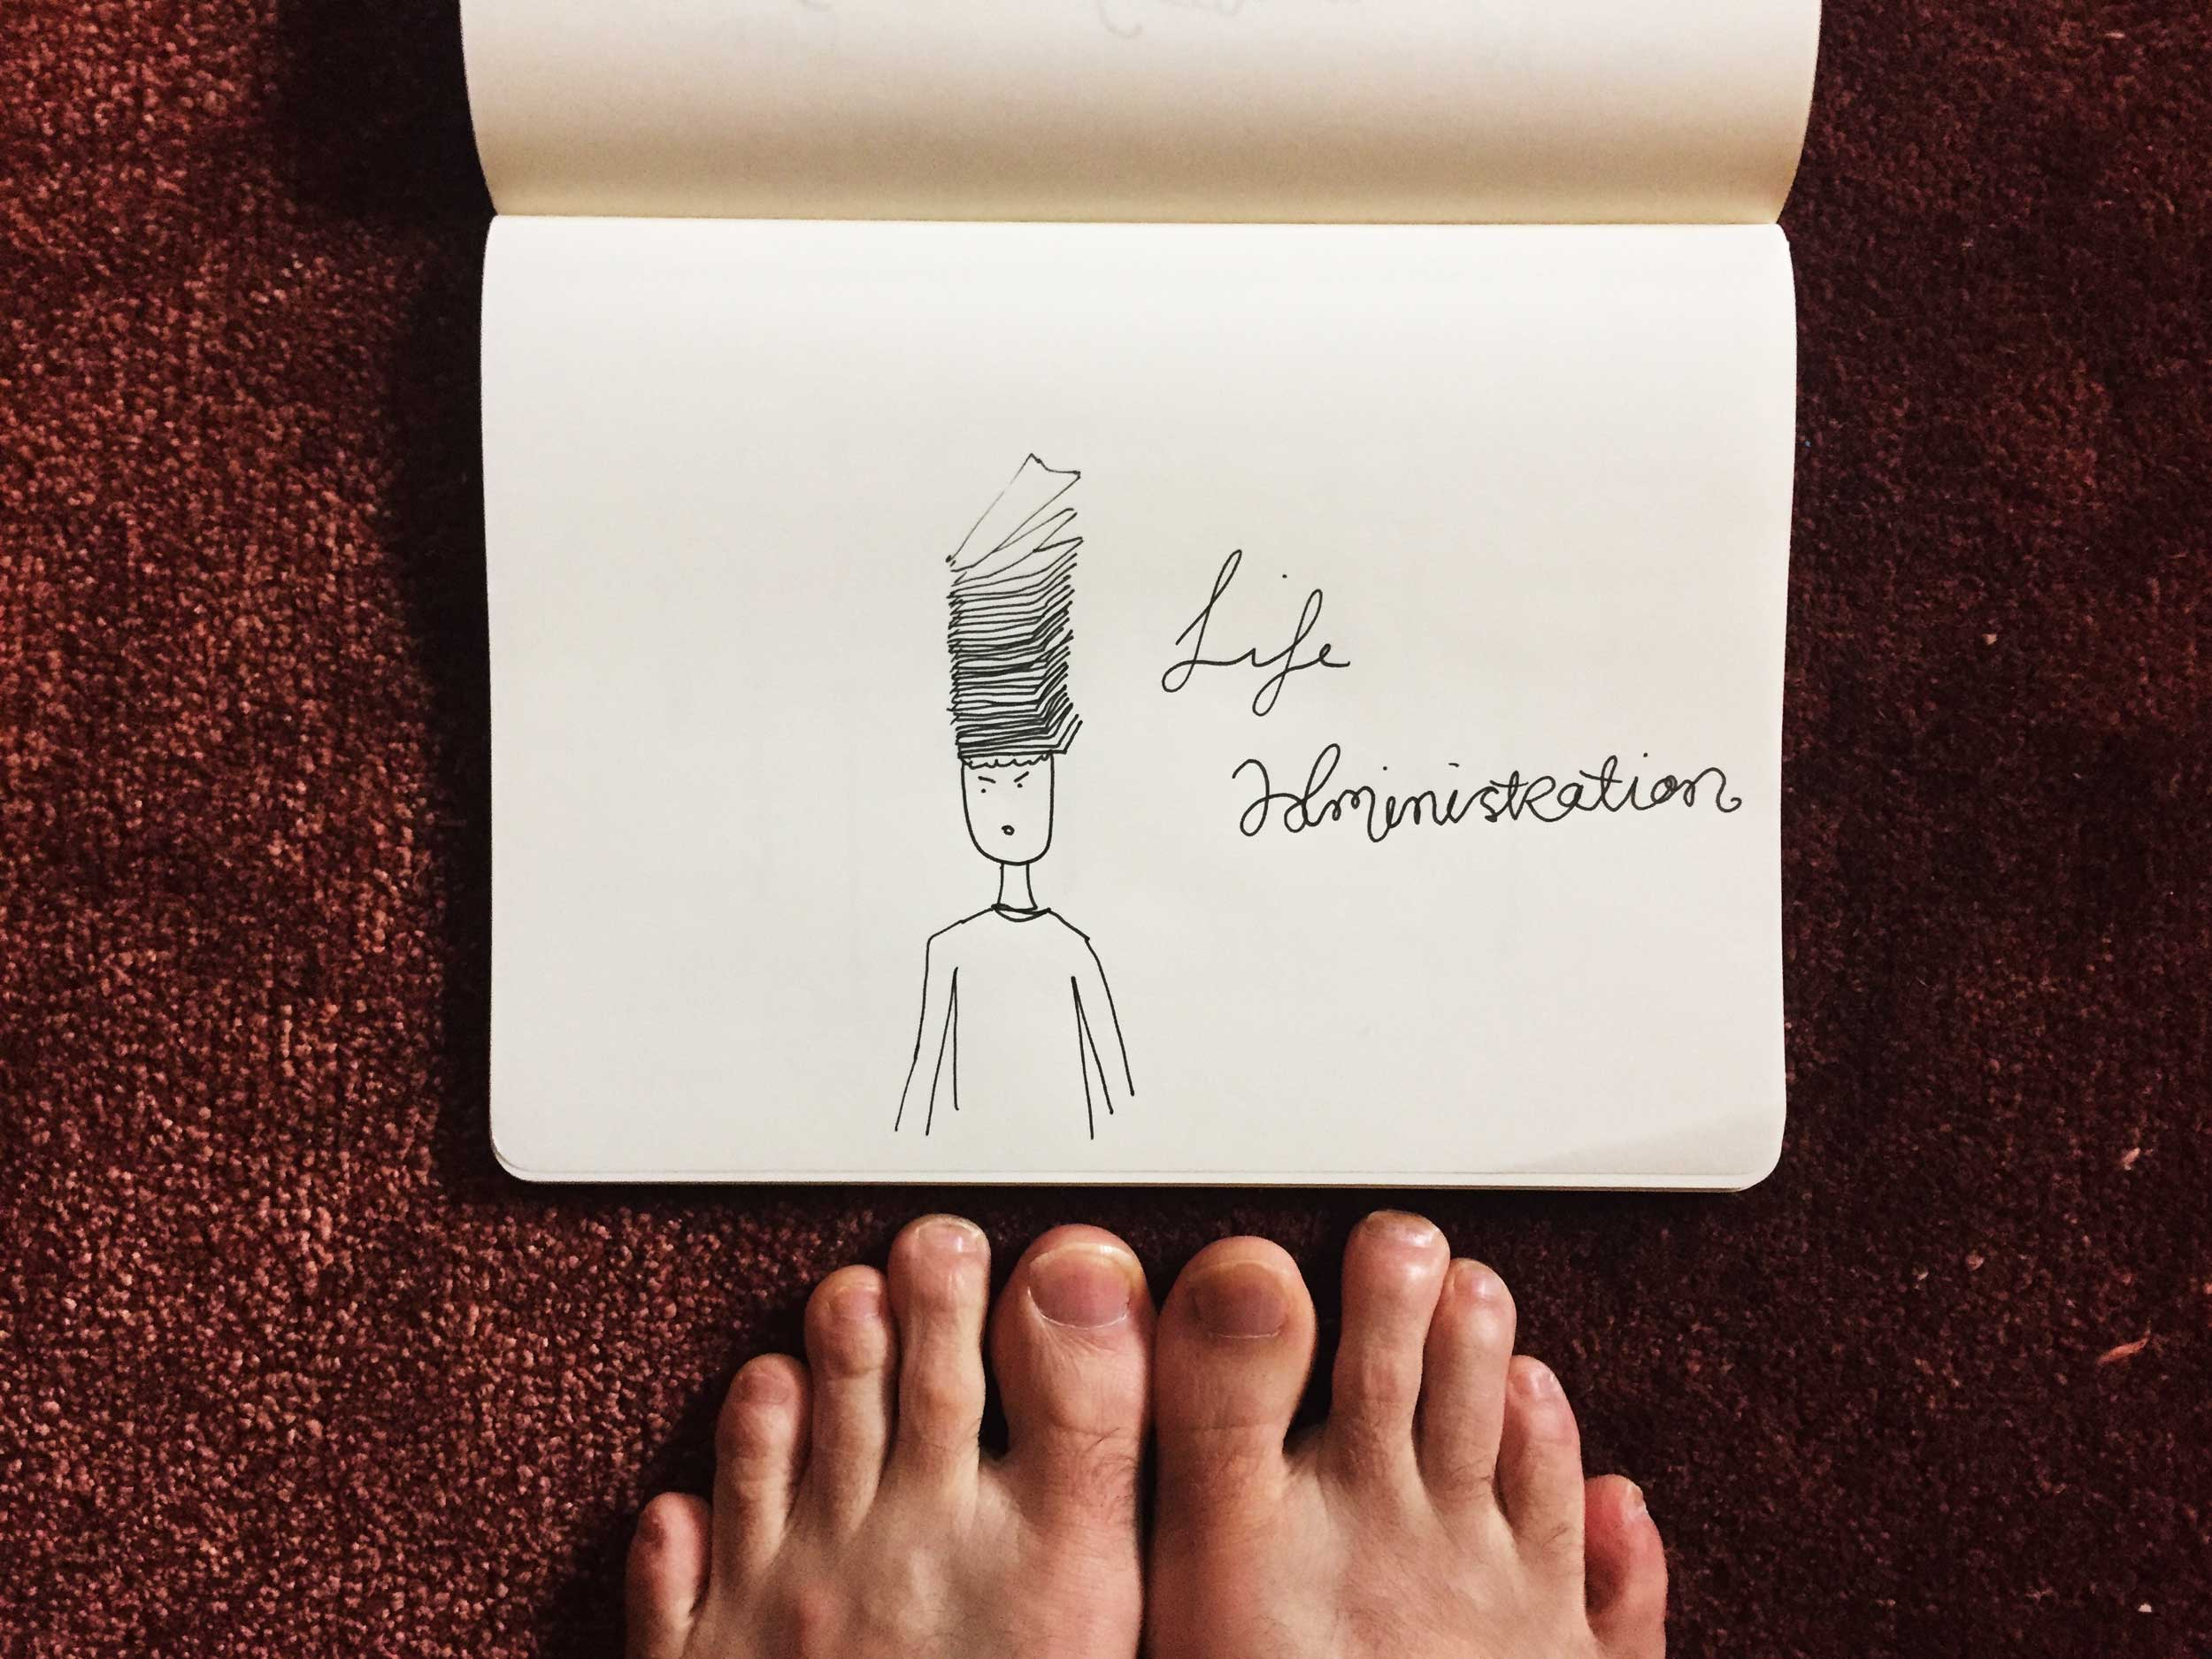 Life administration. Drawing Luke Hockley.